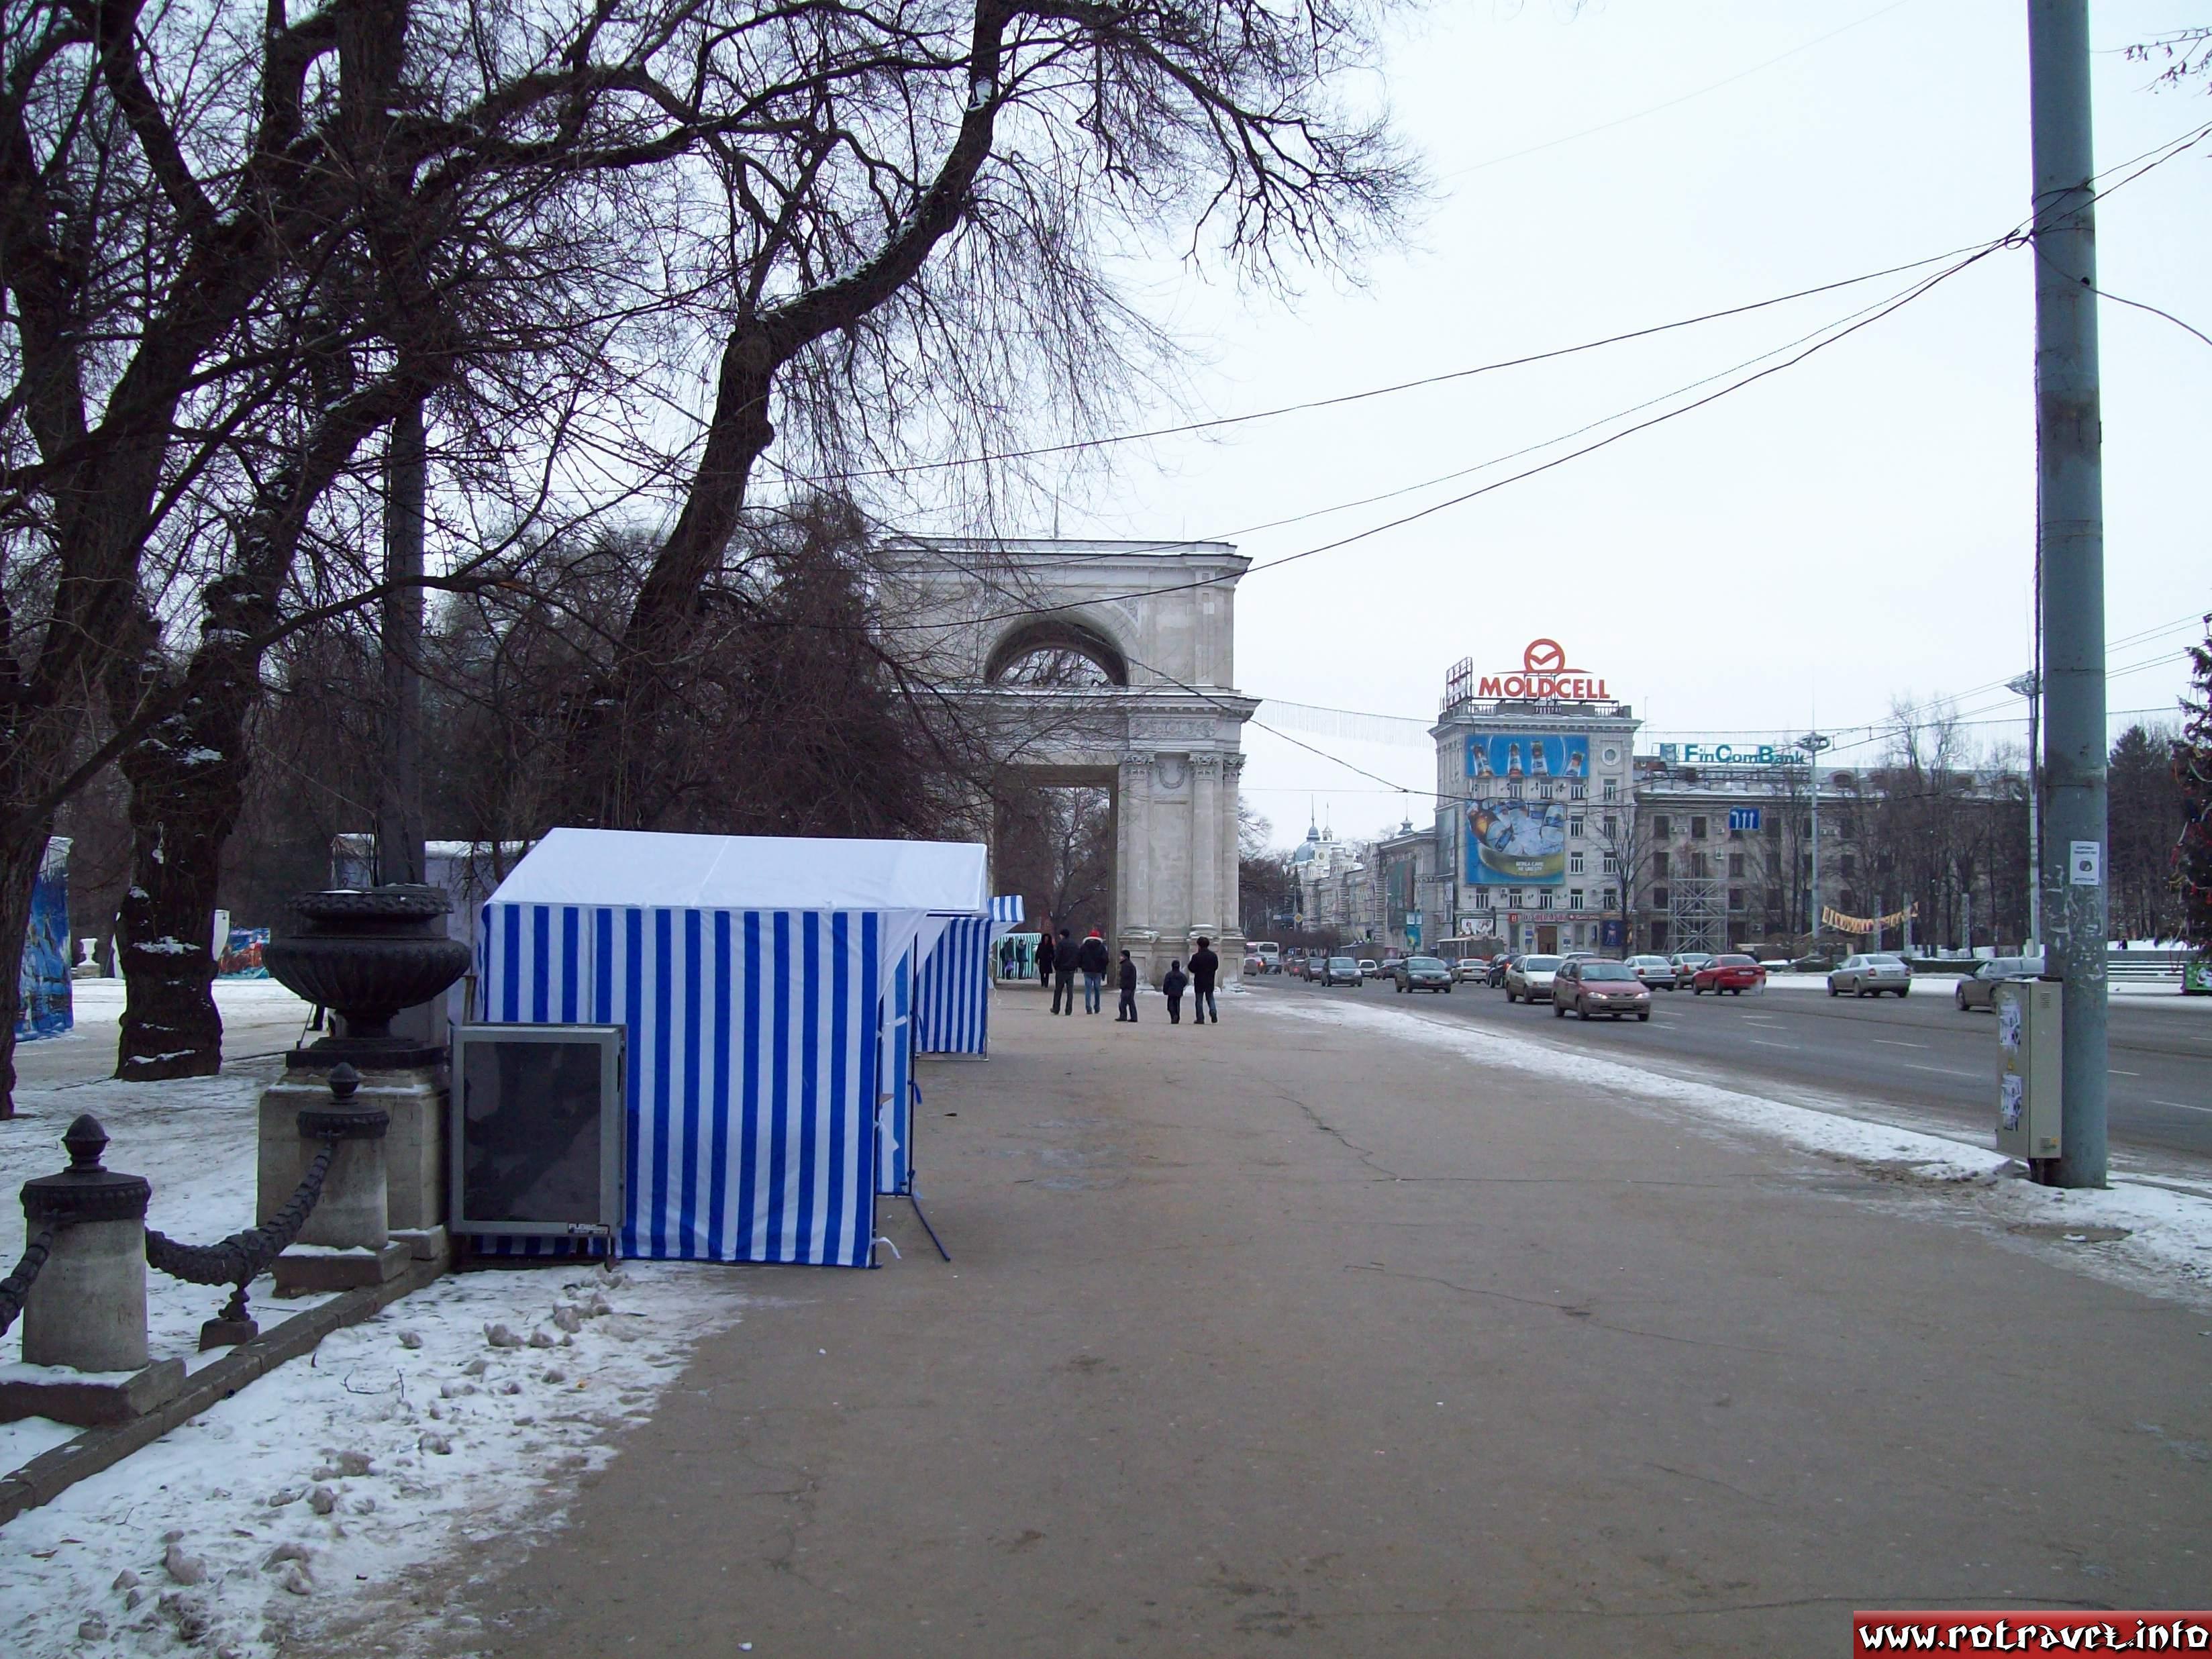 Near the Arch of Triumph, in the center